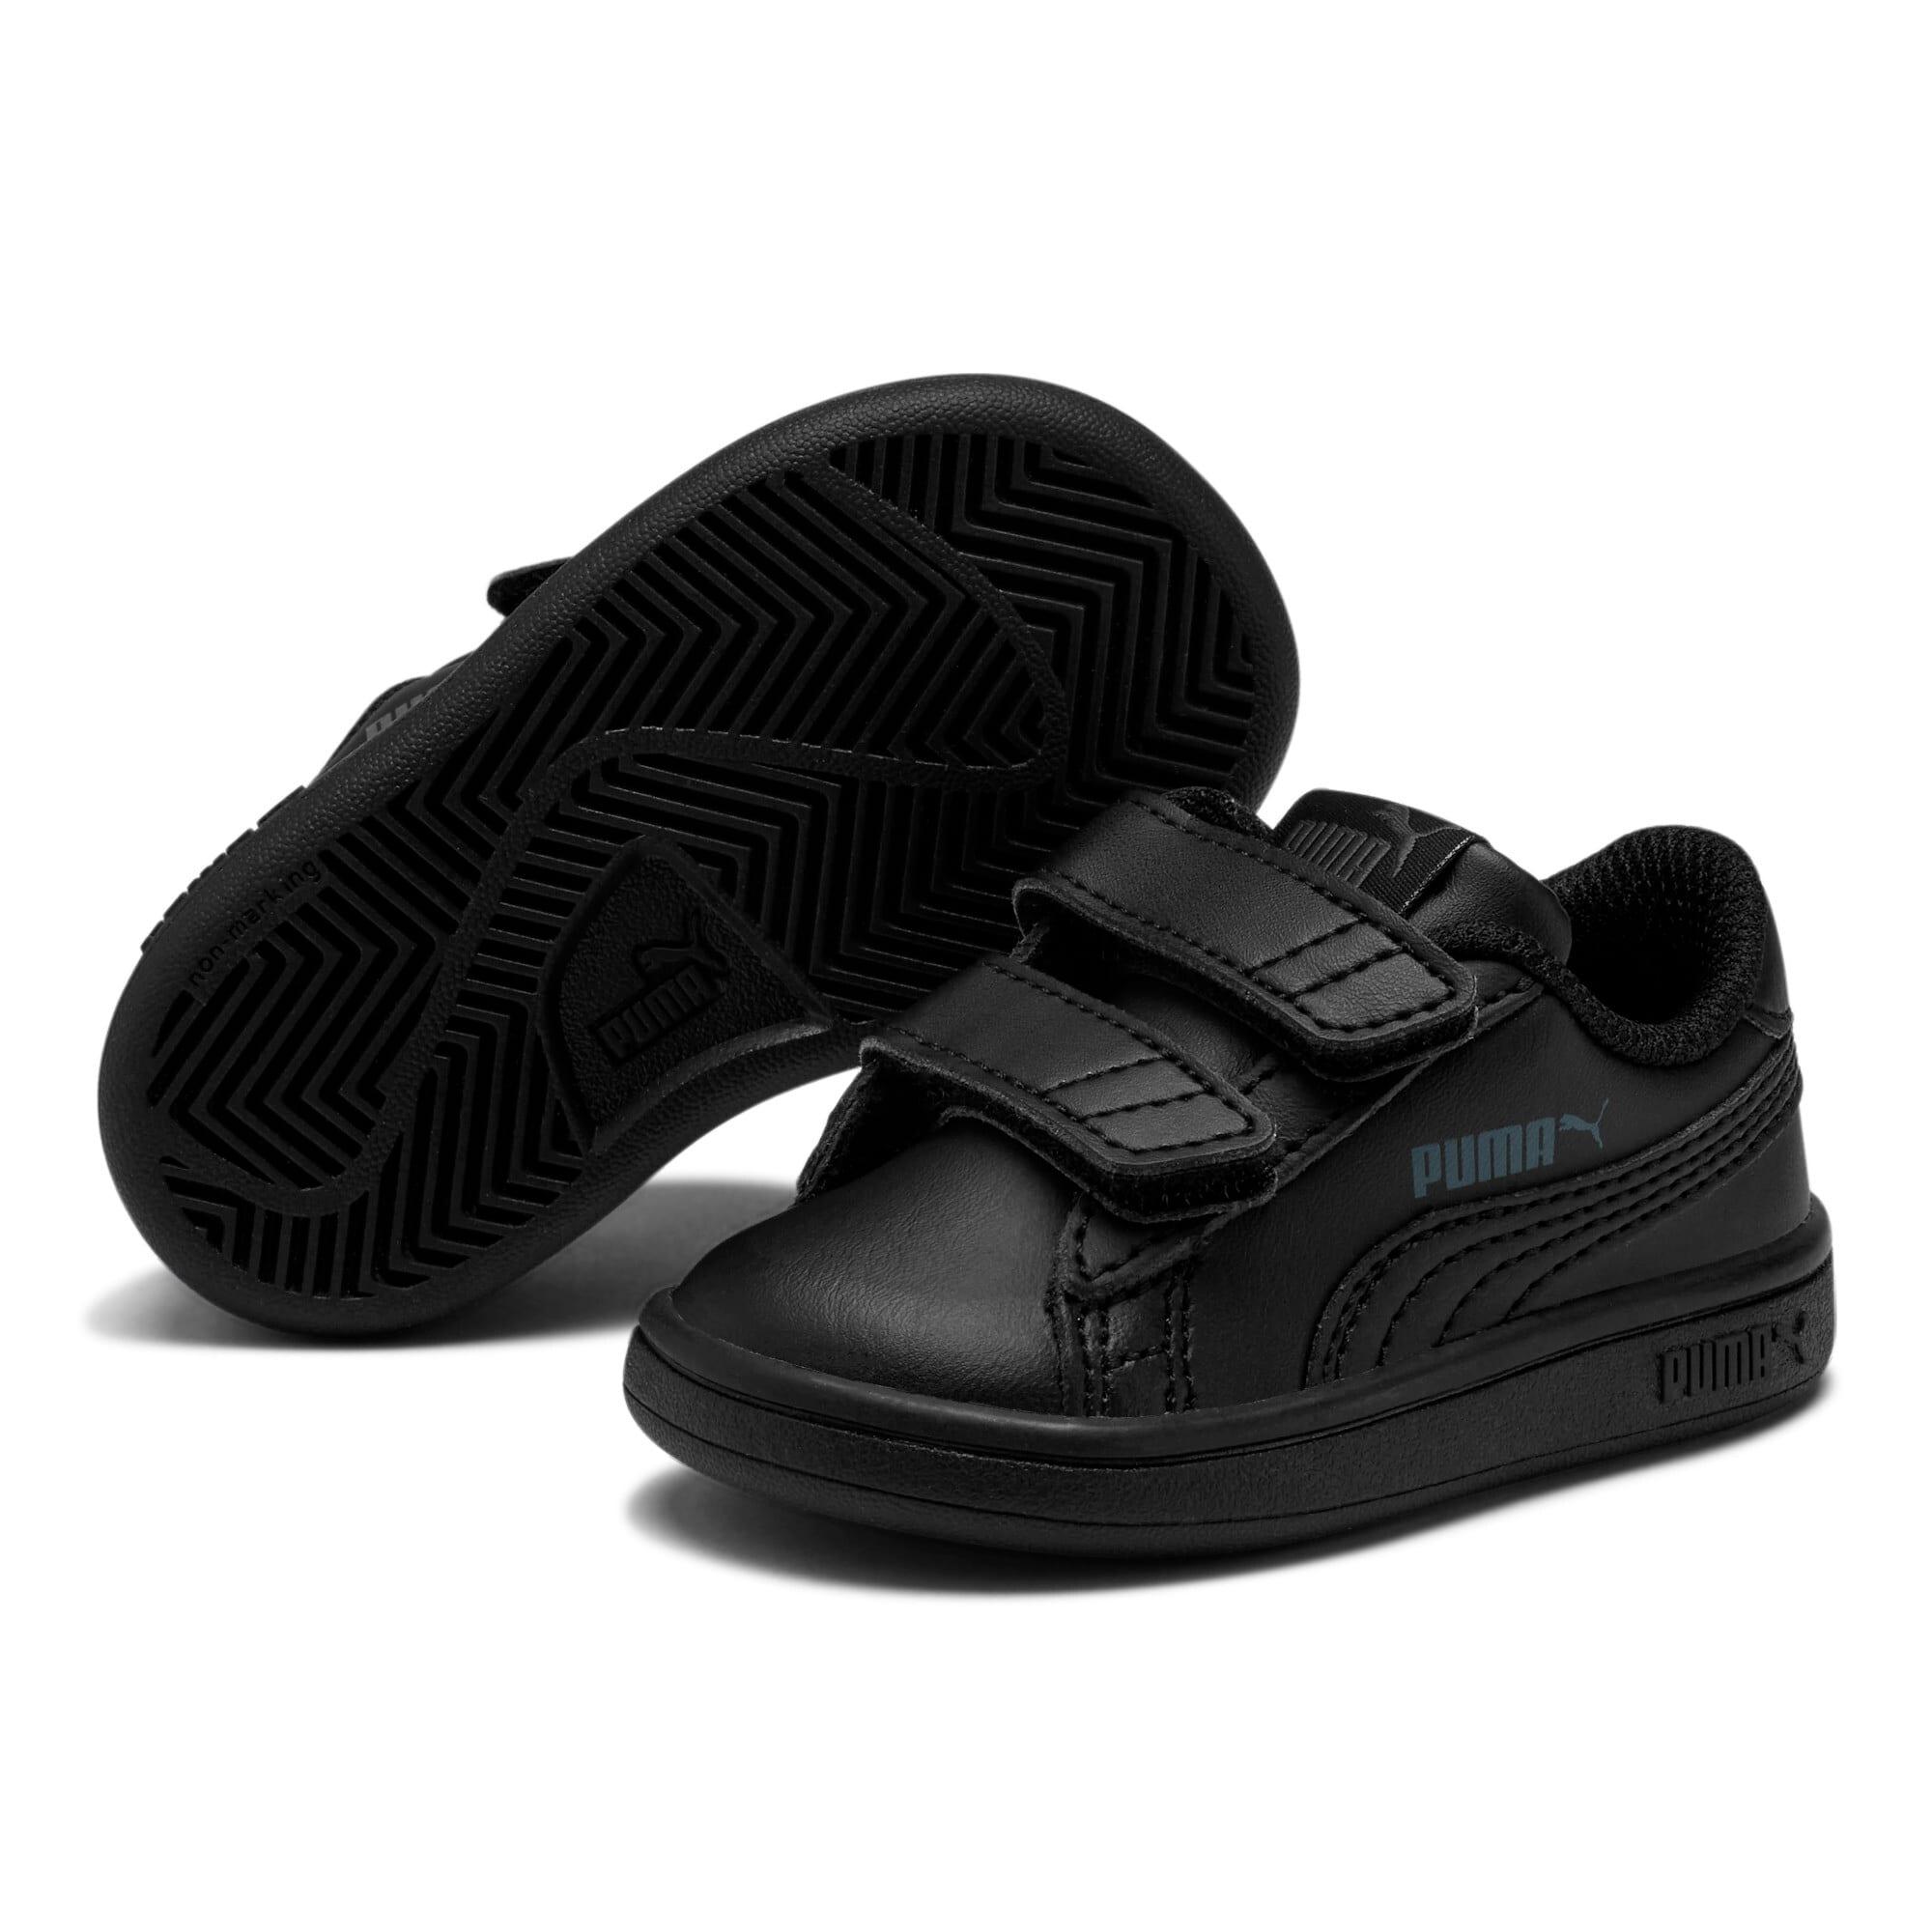 Thumbnail 2 of Puma Smash v2 L V Toddler Shoes, Puma Black-Puma Black, medium